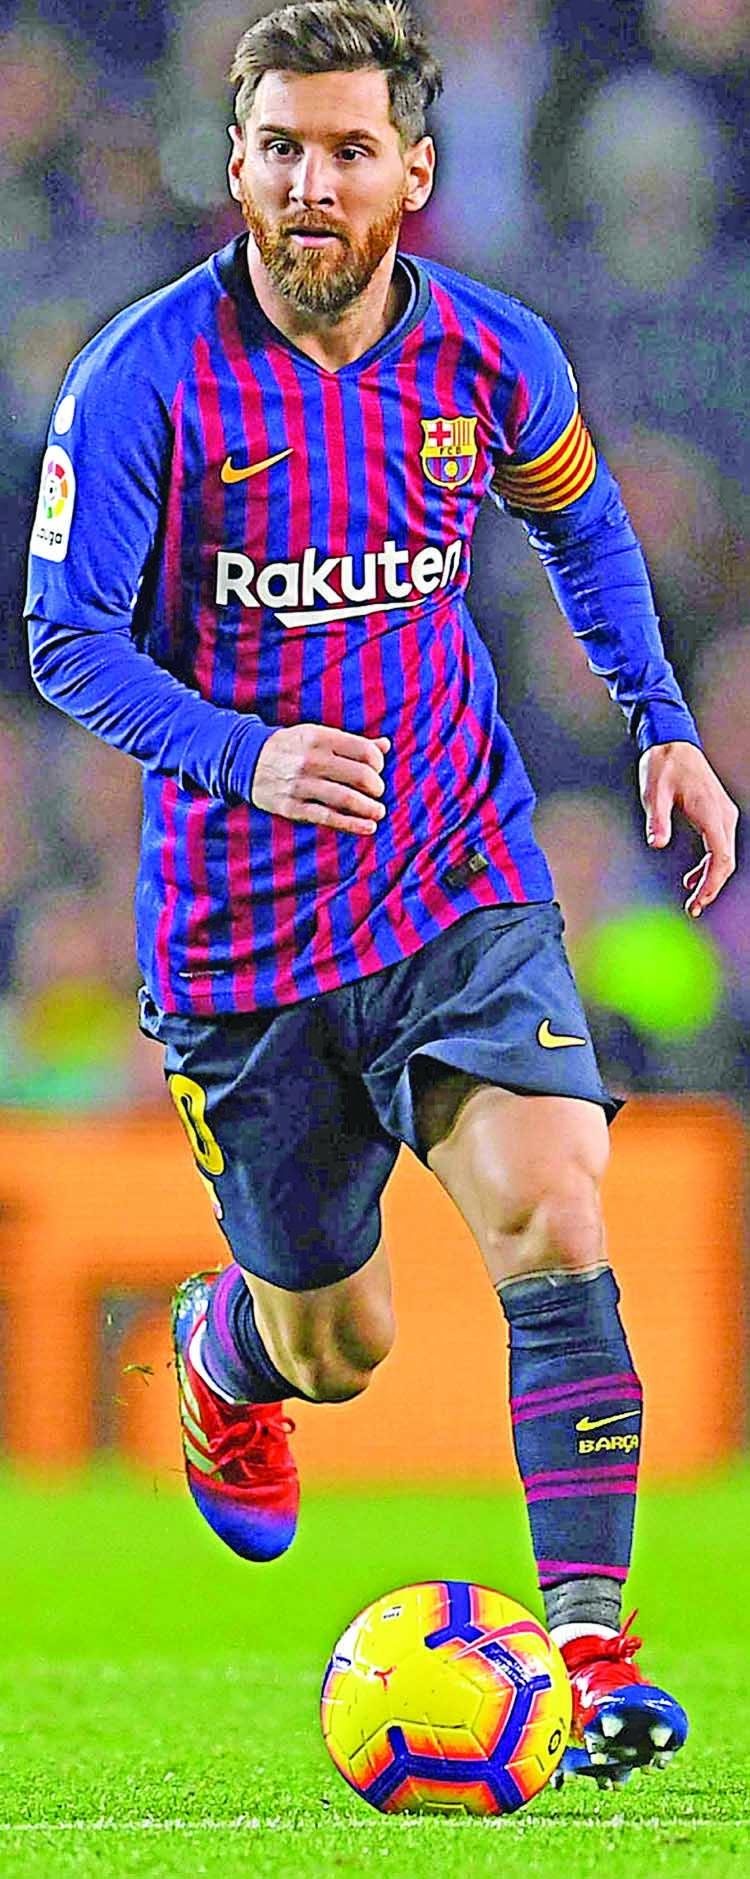 Messi, Guardiola donate 1m euros